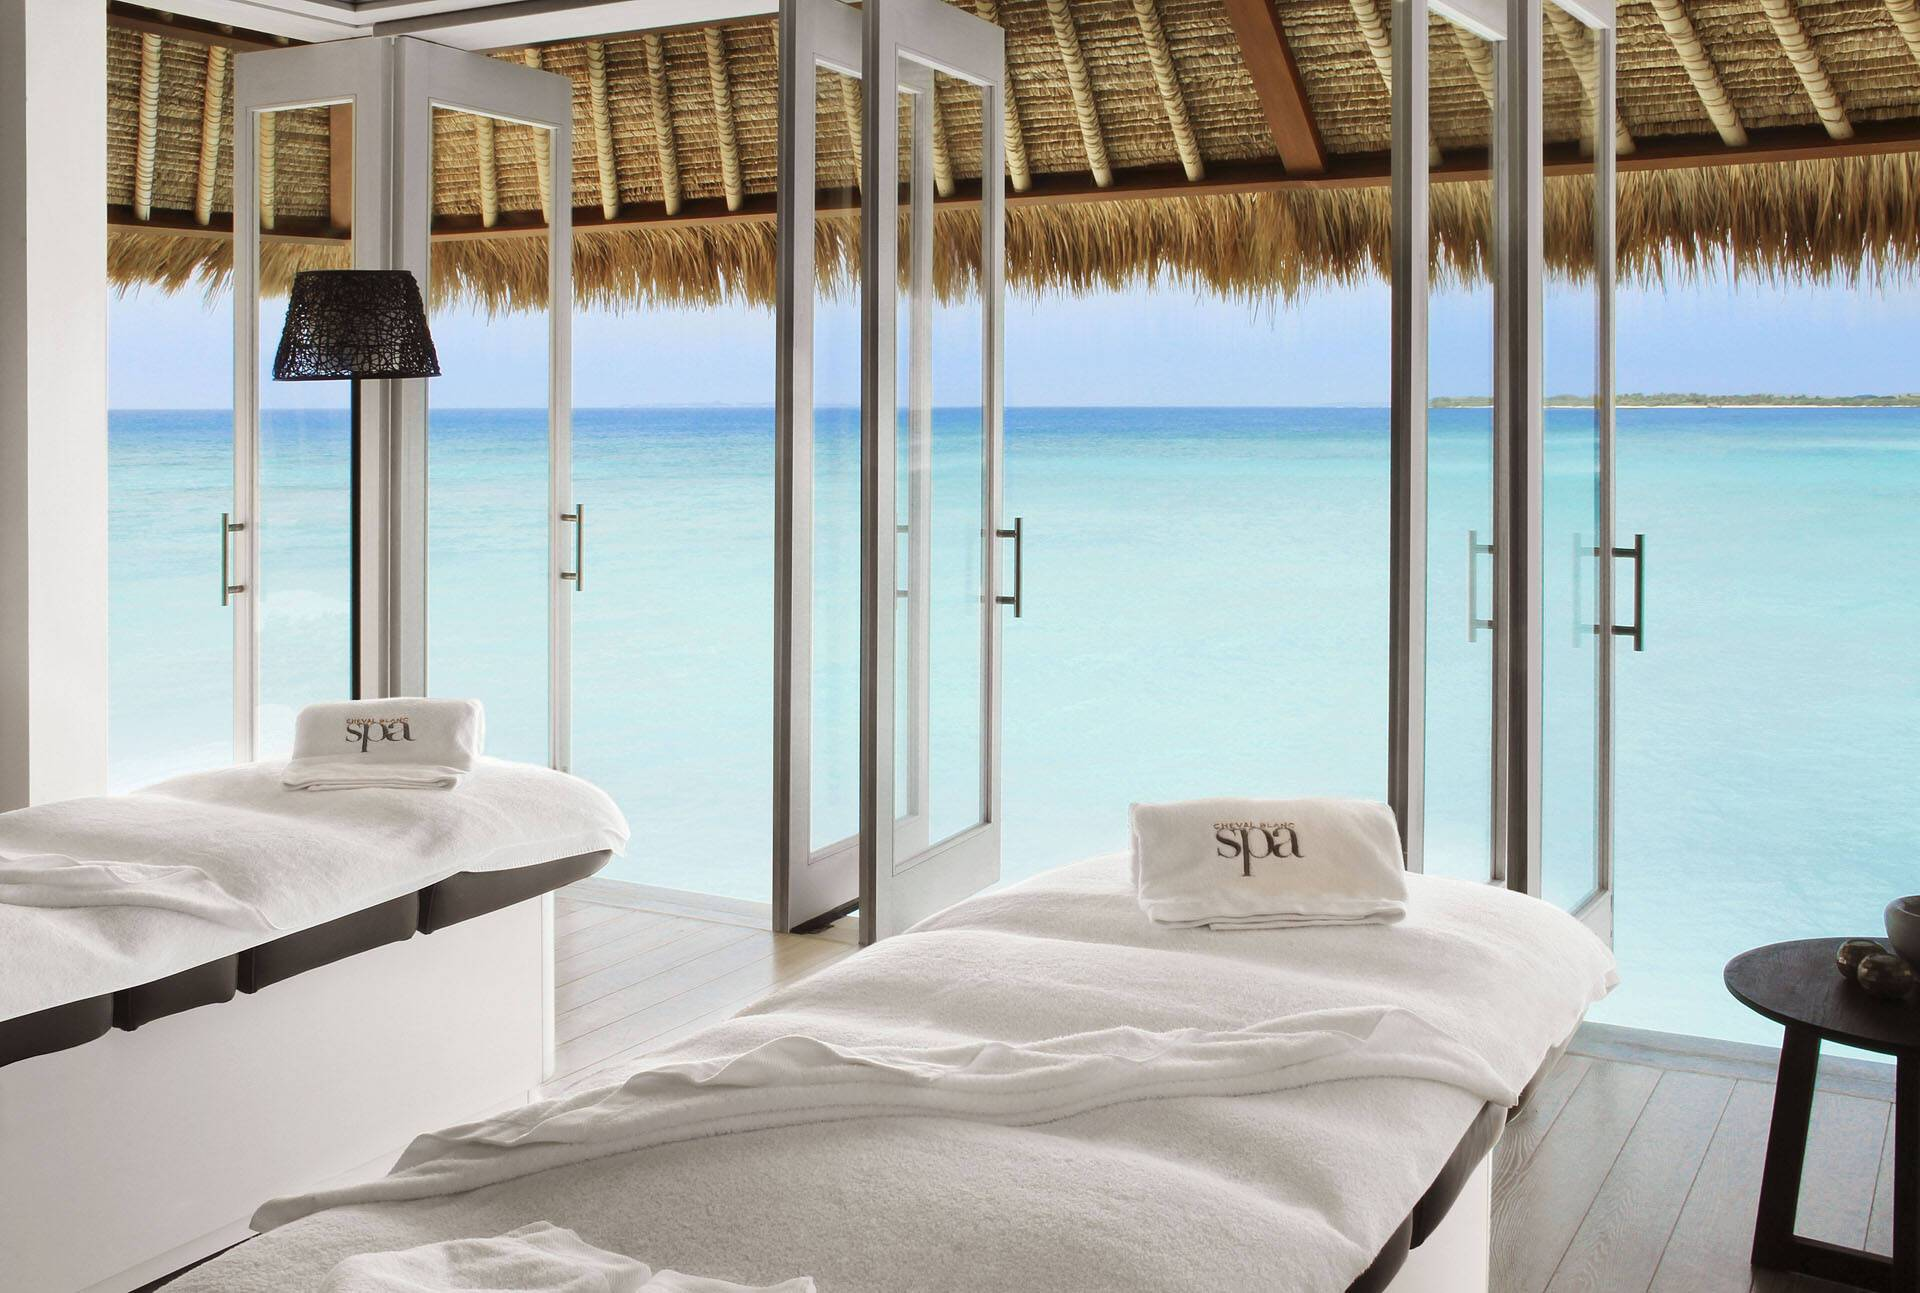 Cheval Blanc Randheli Maldives Spa S Candito